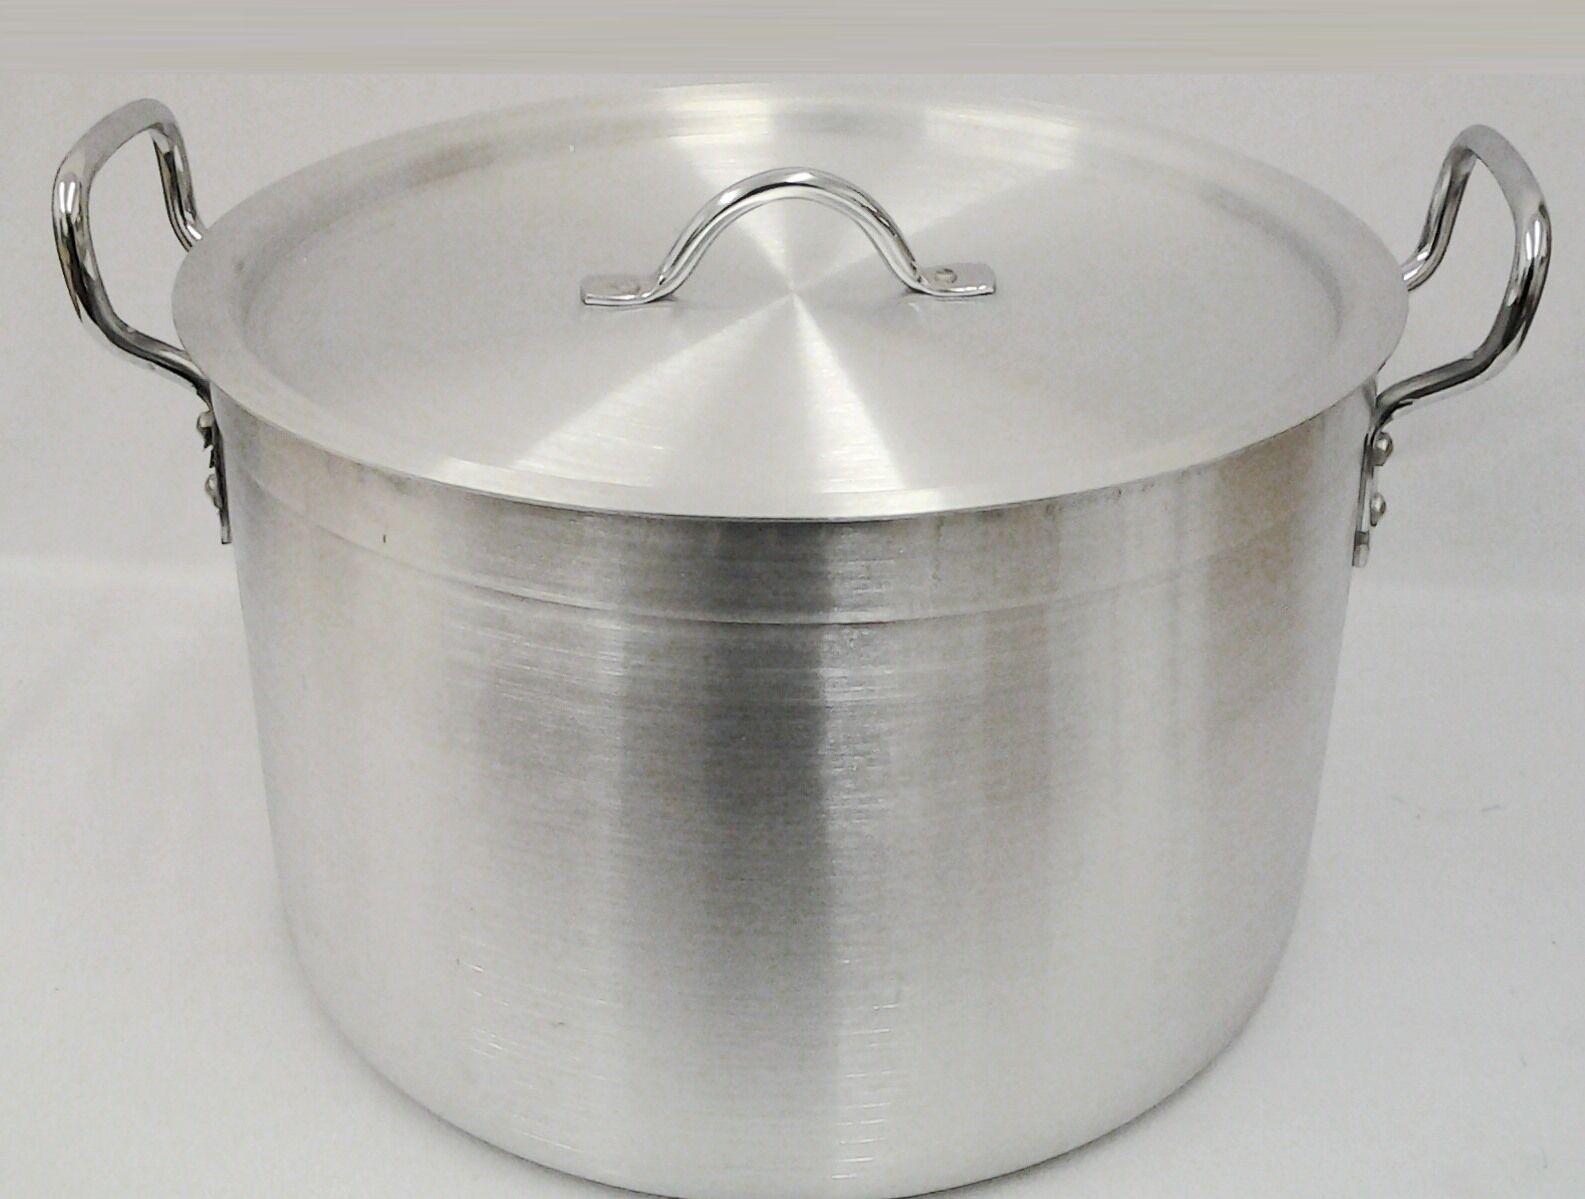 Heavy duty casserole aluminium casserole pan couvercle catering-de sol